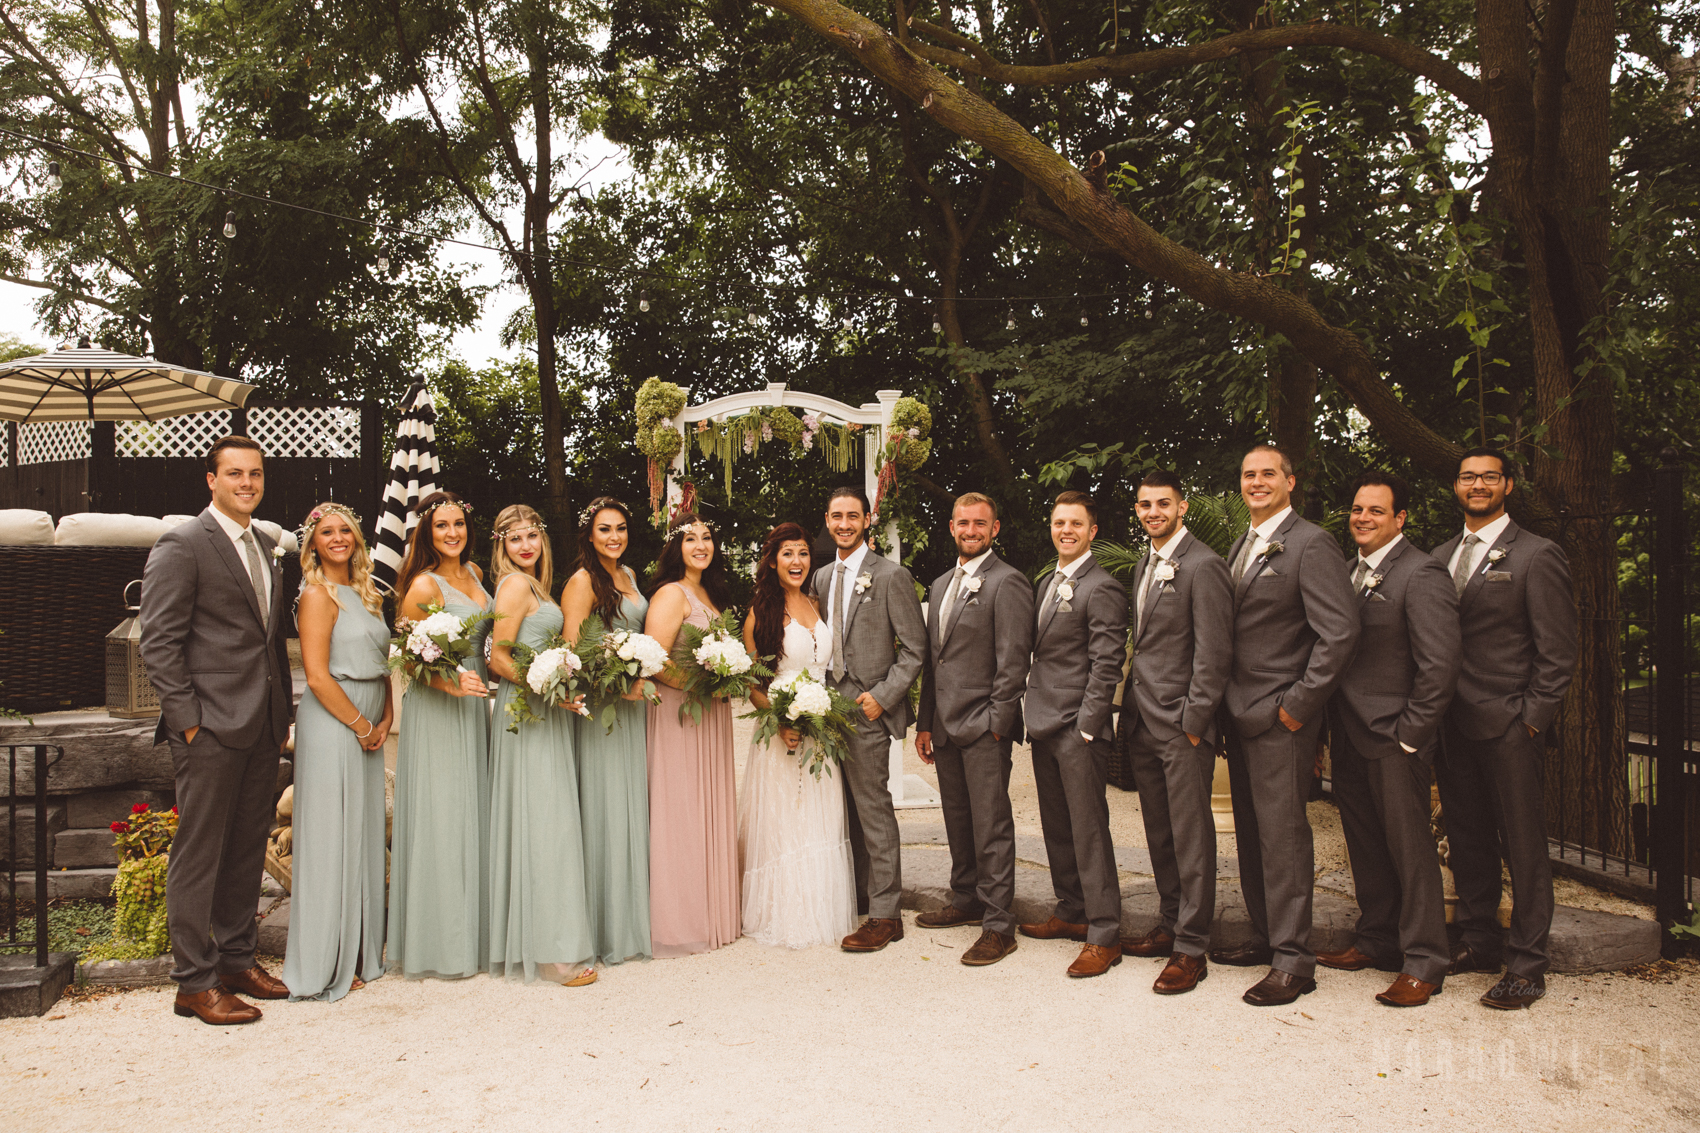 Lake-Geneva-WI-Wedding-bridal-party-formals-3833.jpg